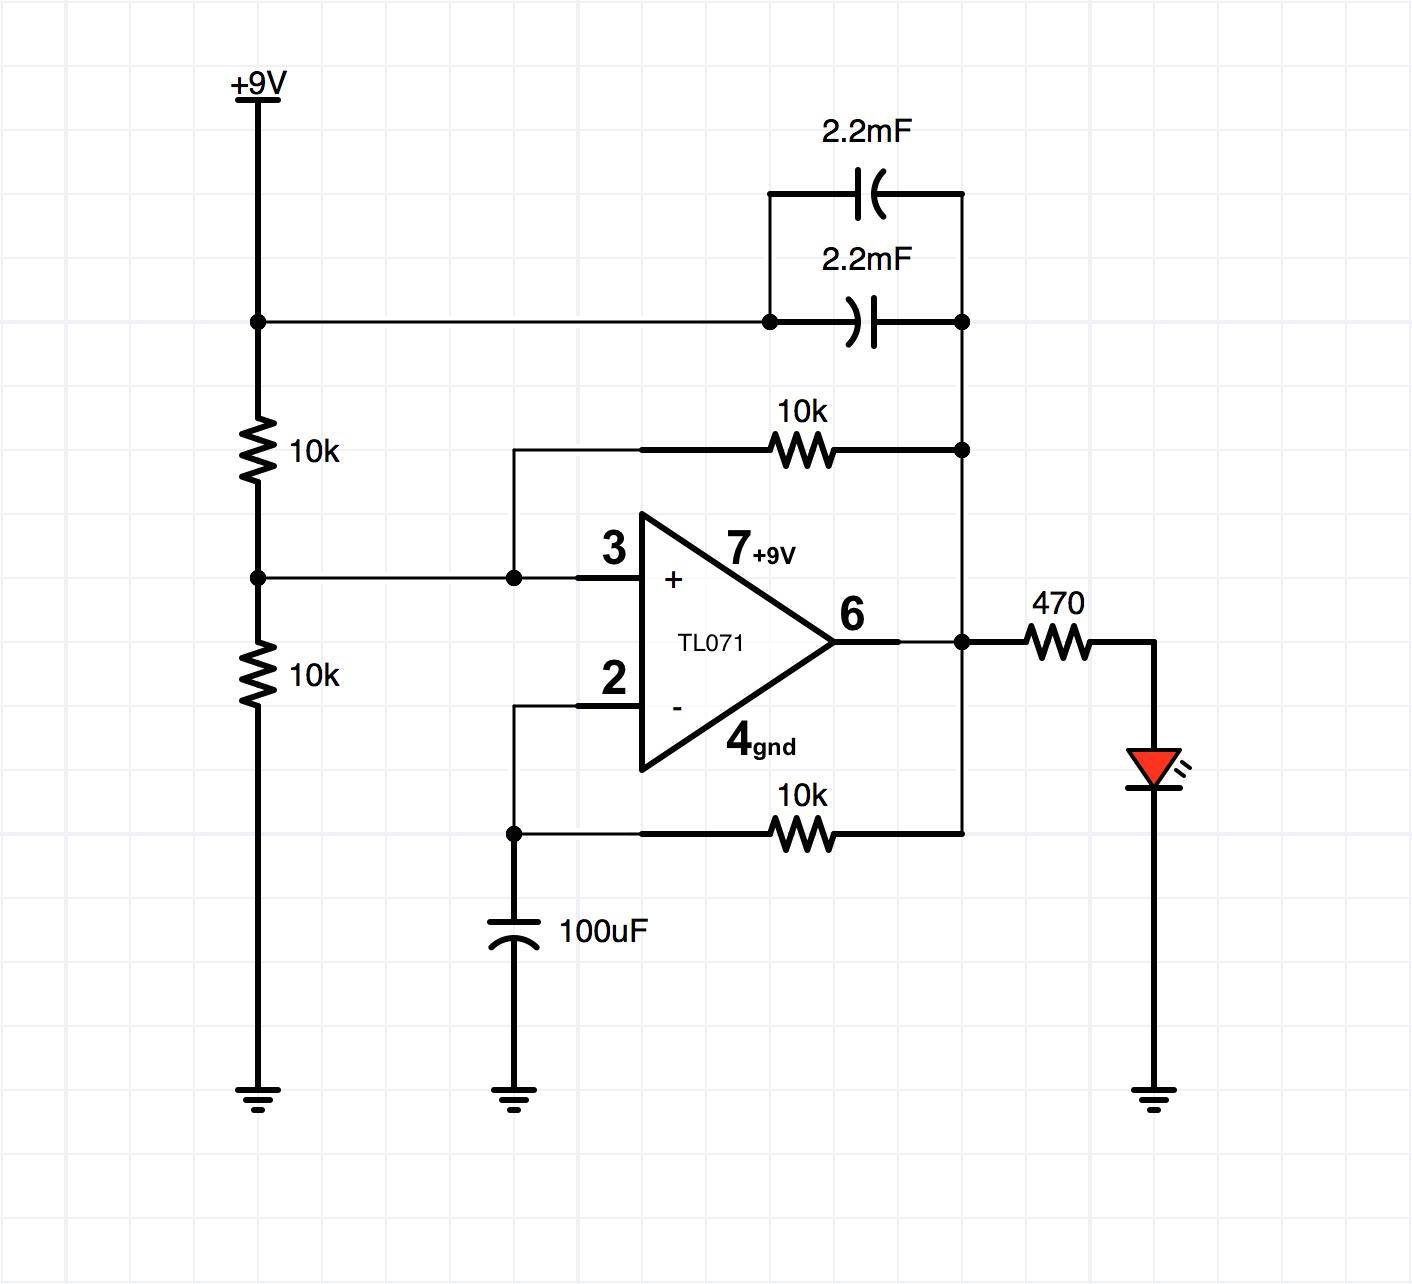 Pumpkin Breathing Led Schematic - Wire Management & Wiring ... on